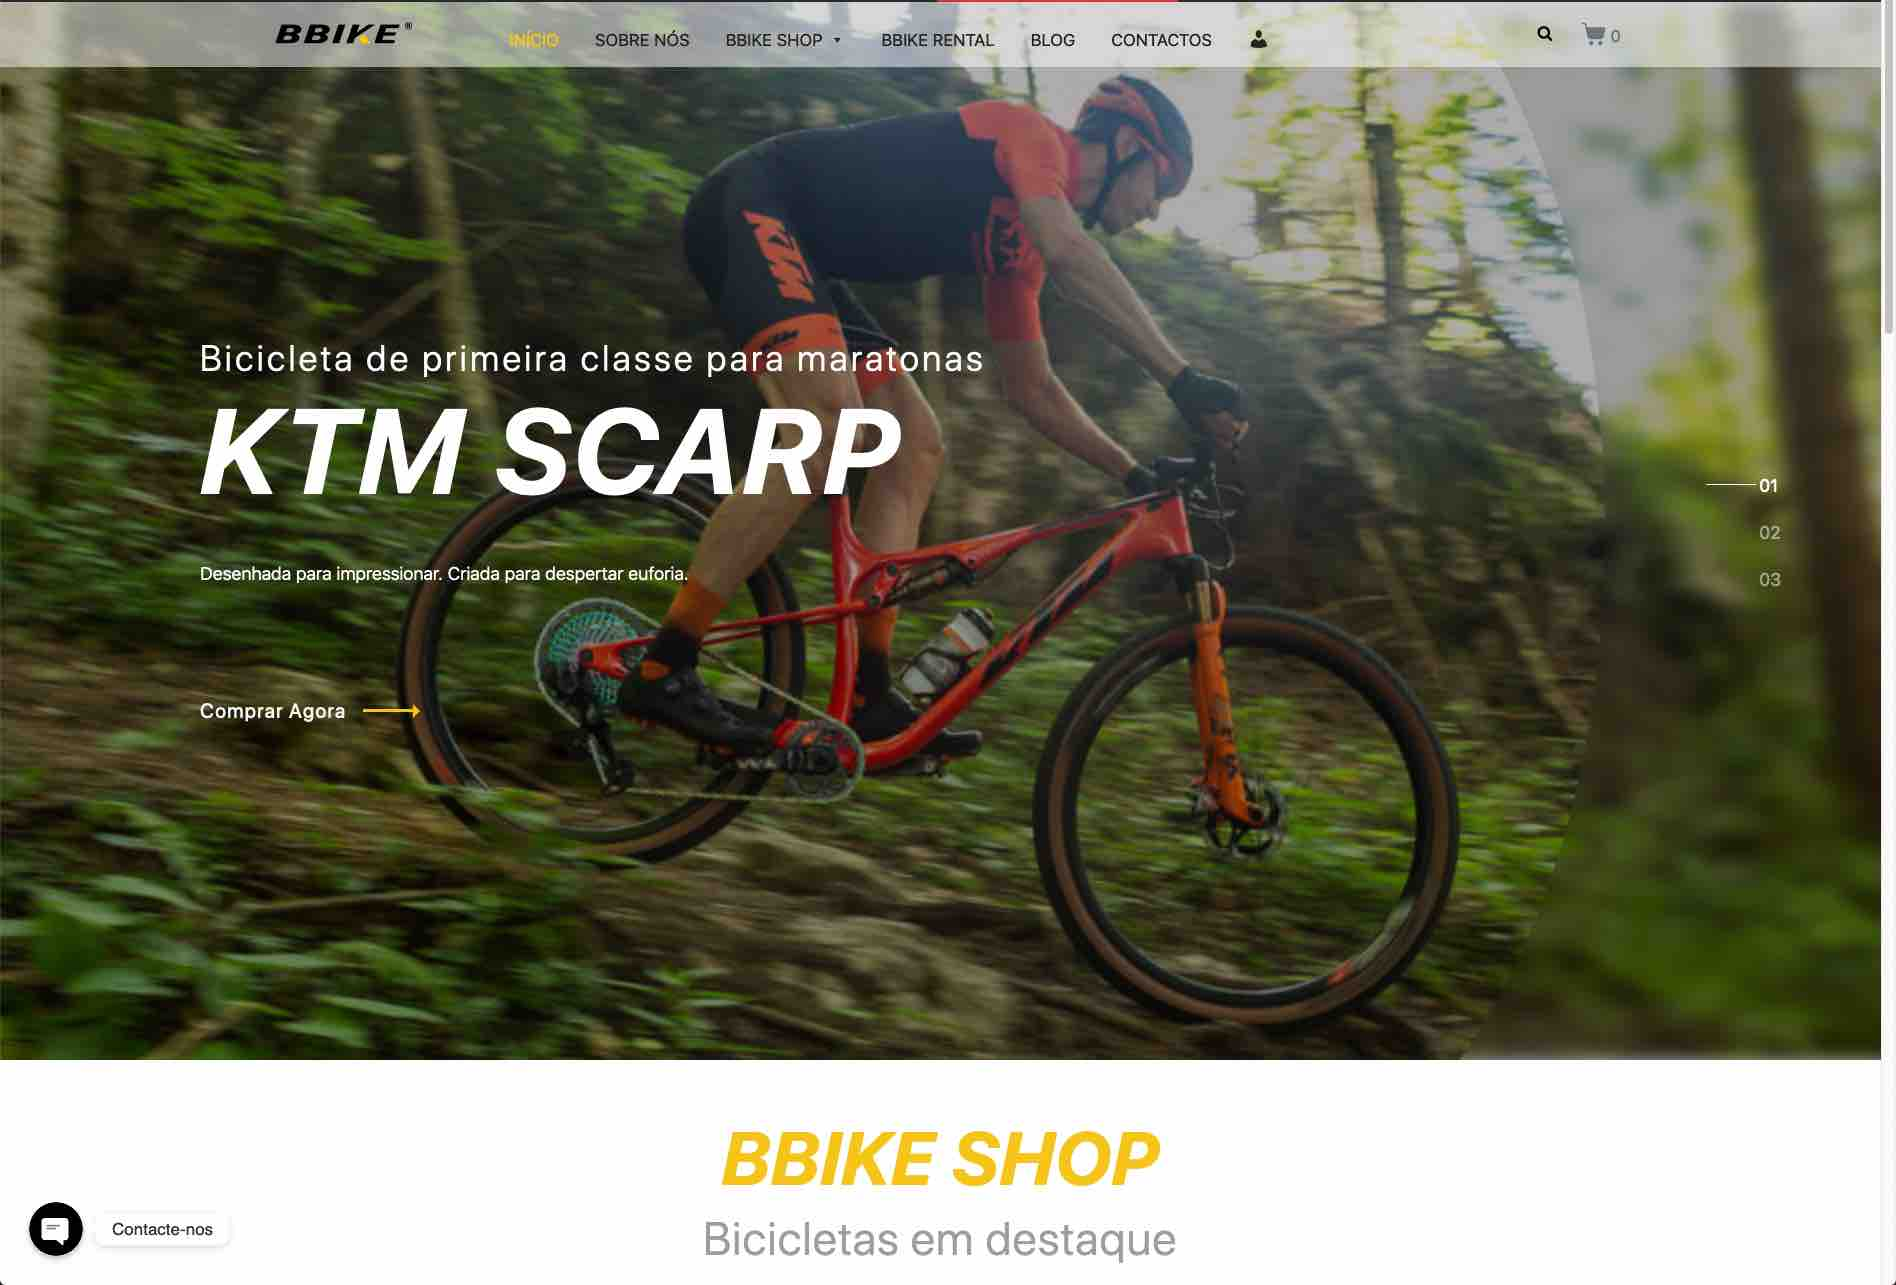 bbike-braganca-loja-online1